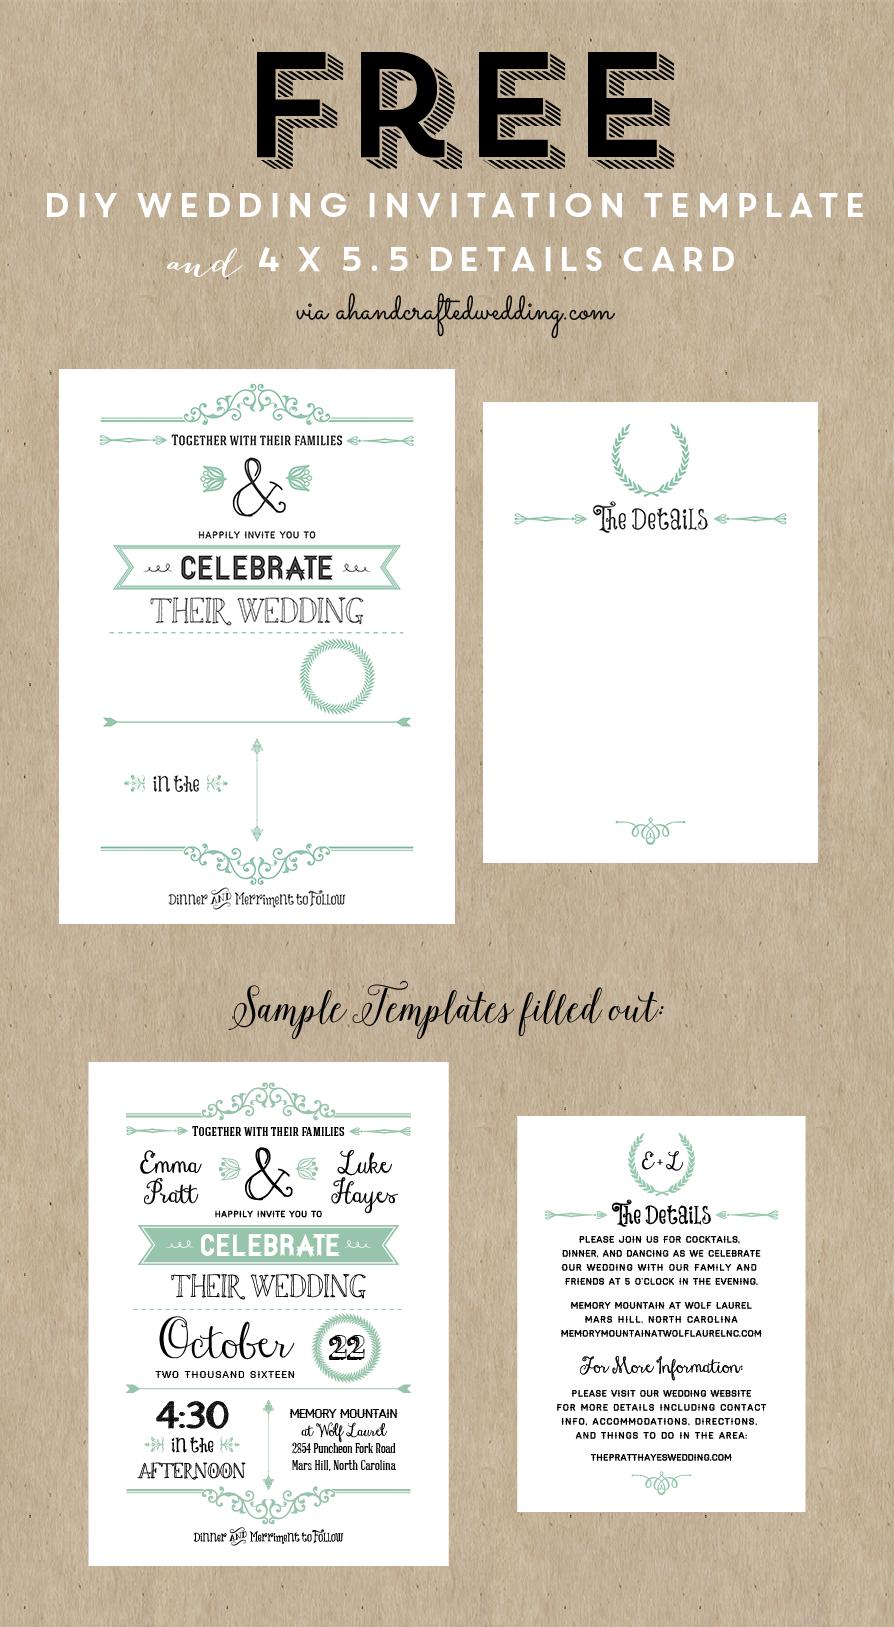 Free Printable Wedding Invitation Template   Wedding   Free Wedding - Wedding Invitation Cards Printable Free